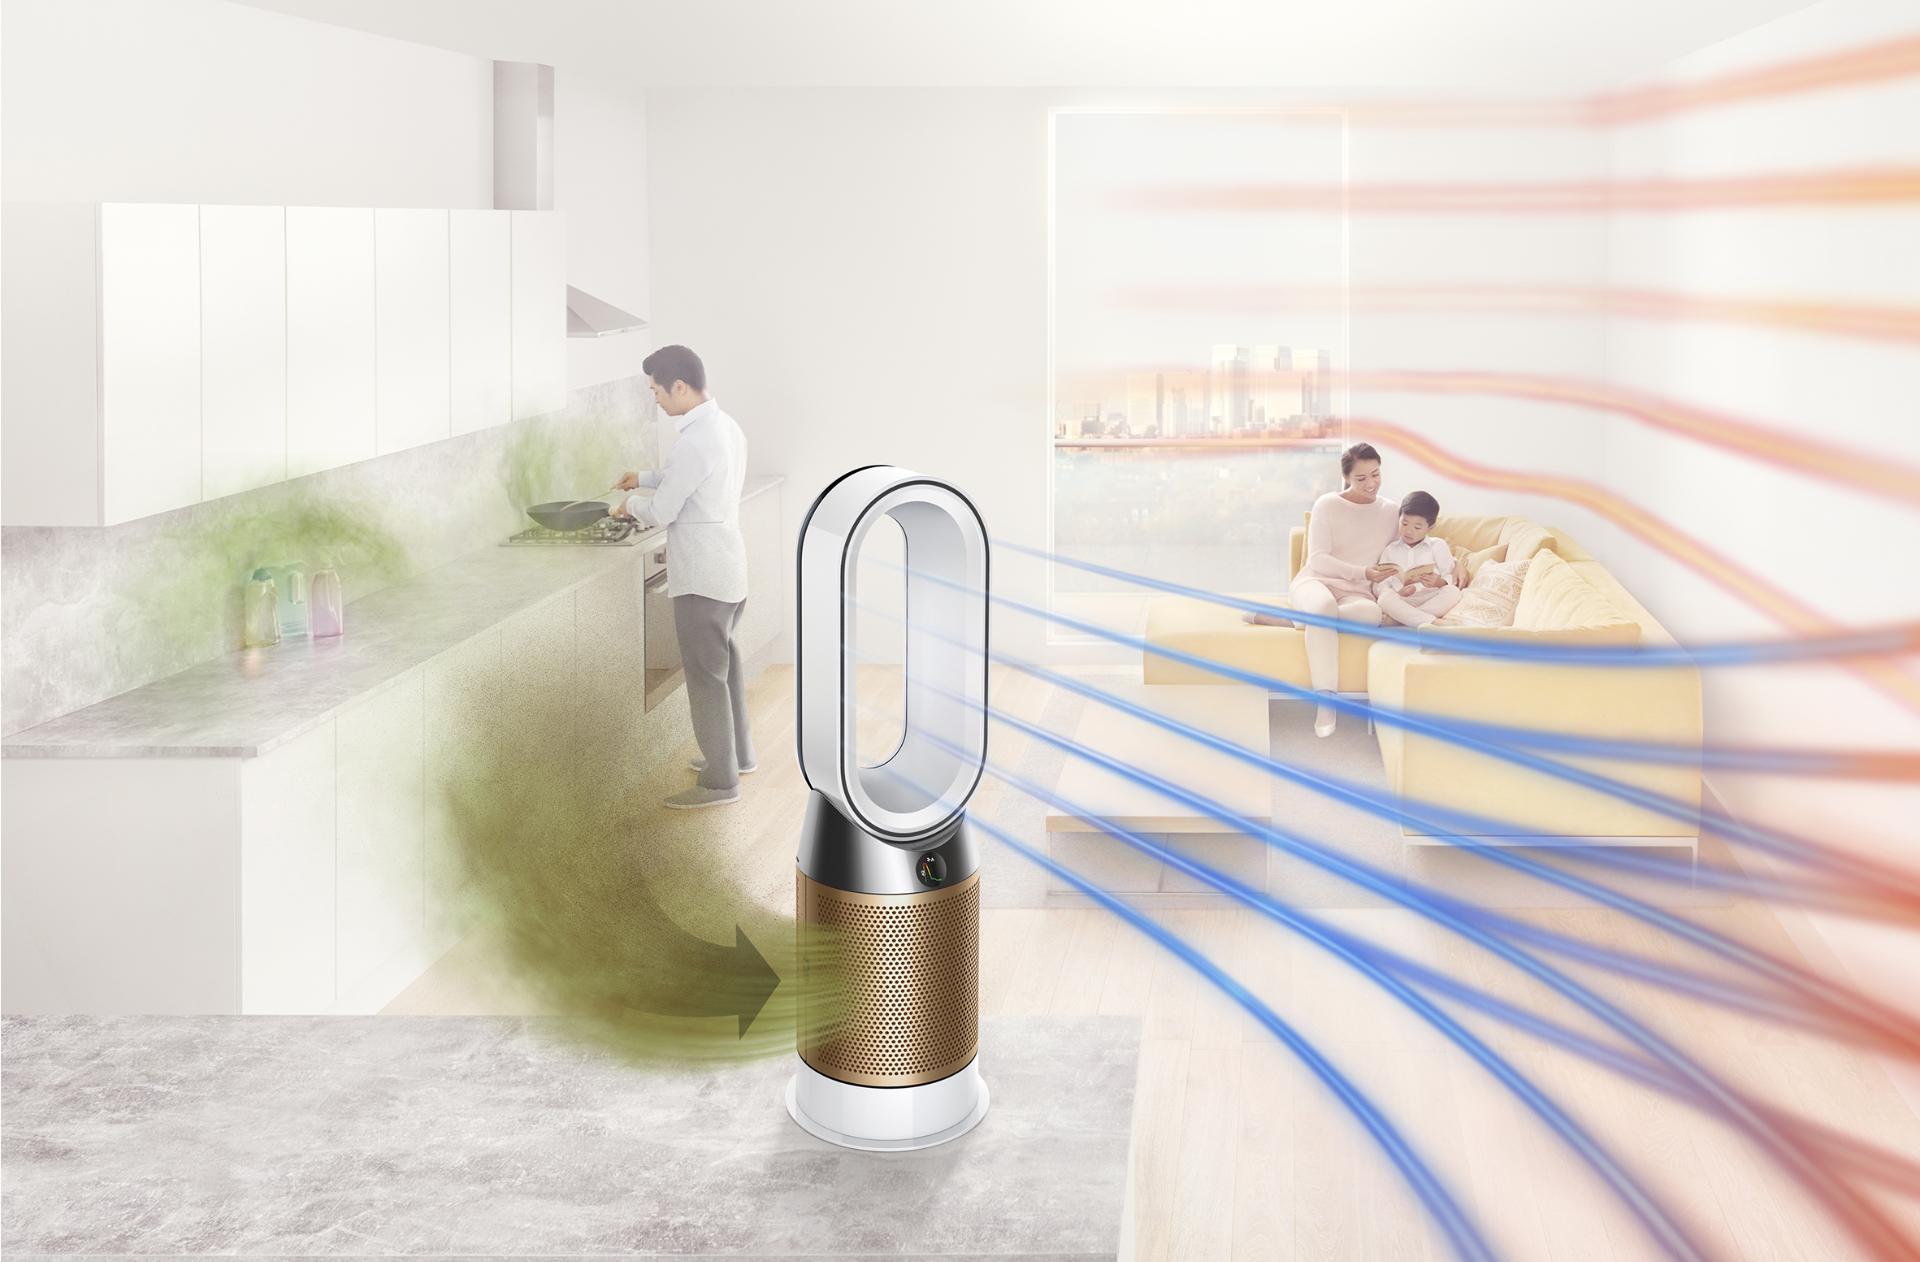 Dyson Pure Hot + Cool Cryptomic 風扇暖風空氣清新機吹送淨化空氣